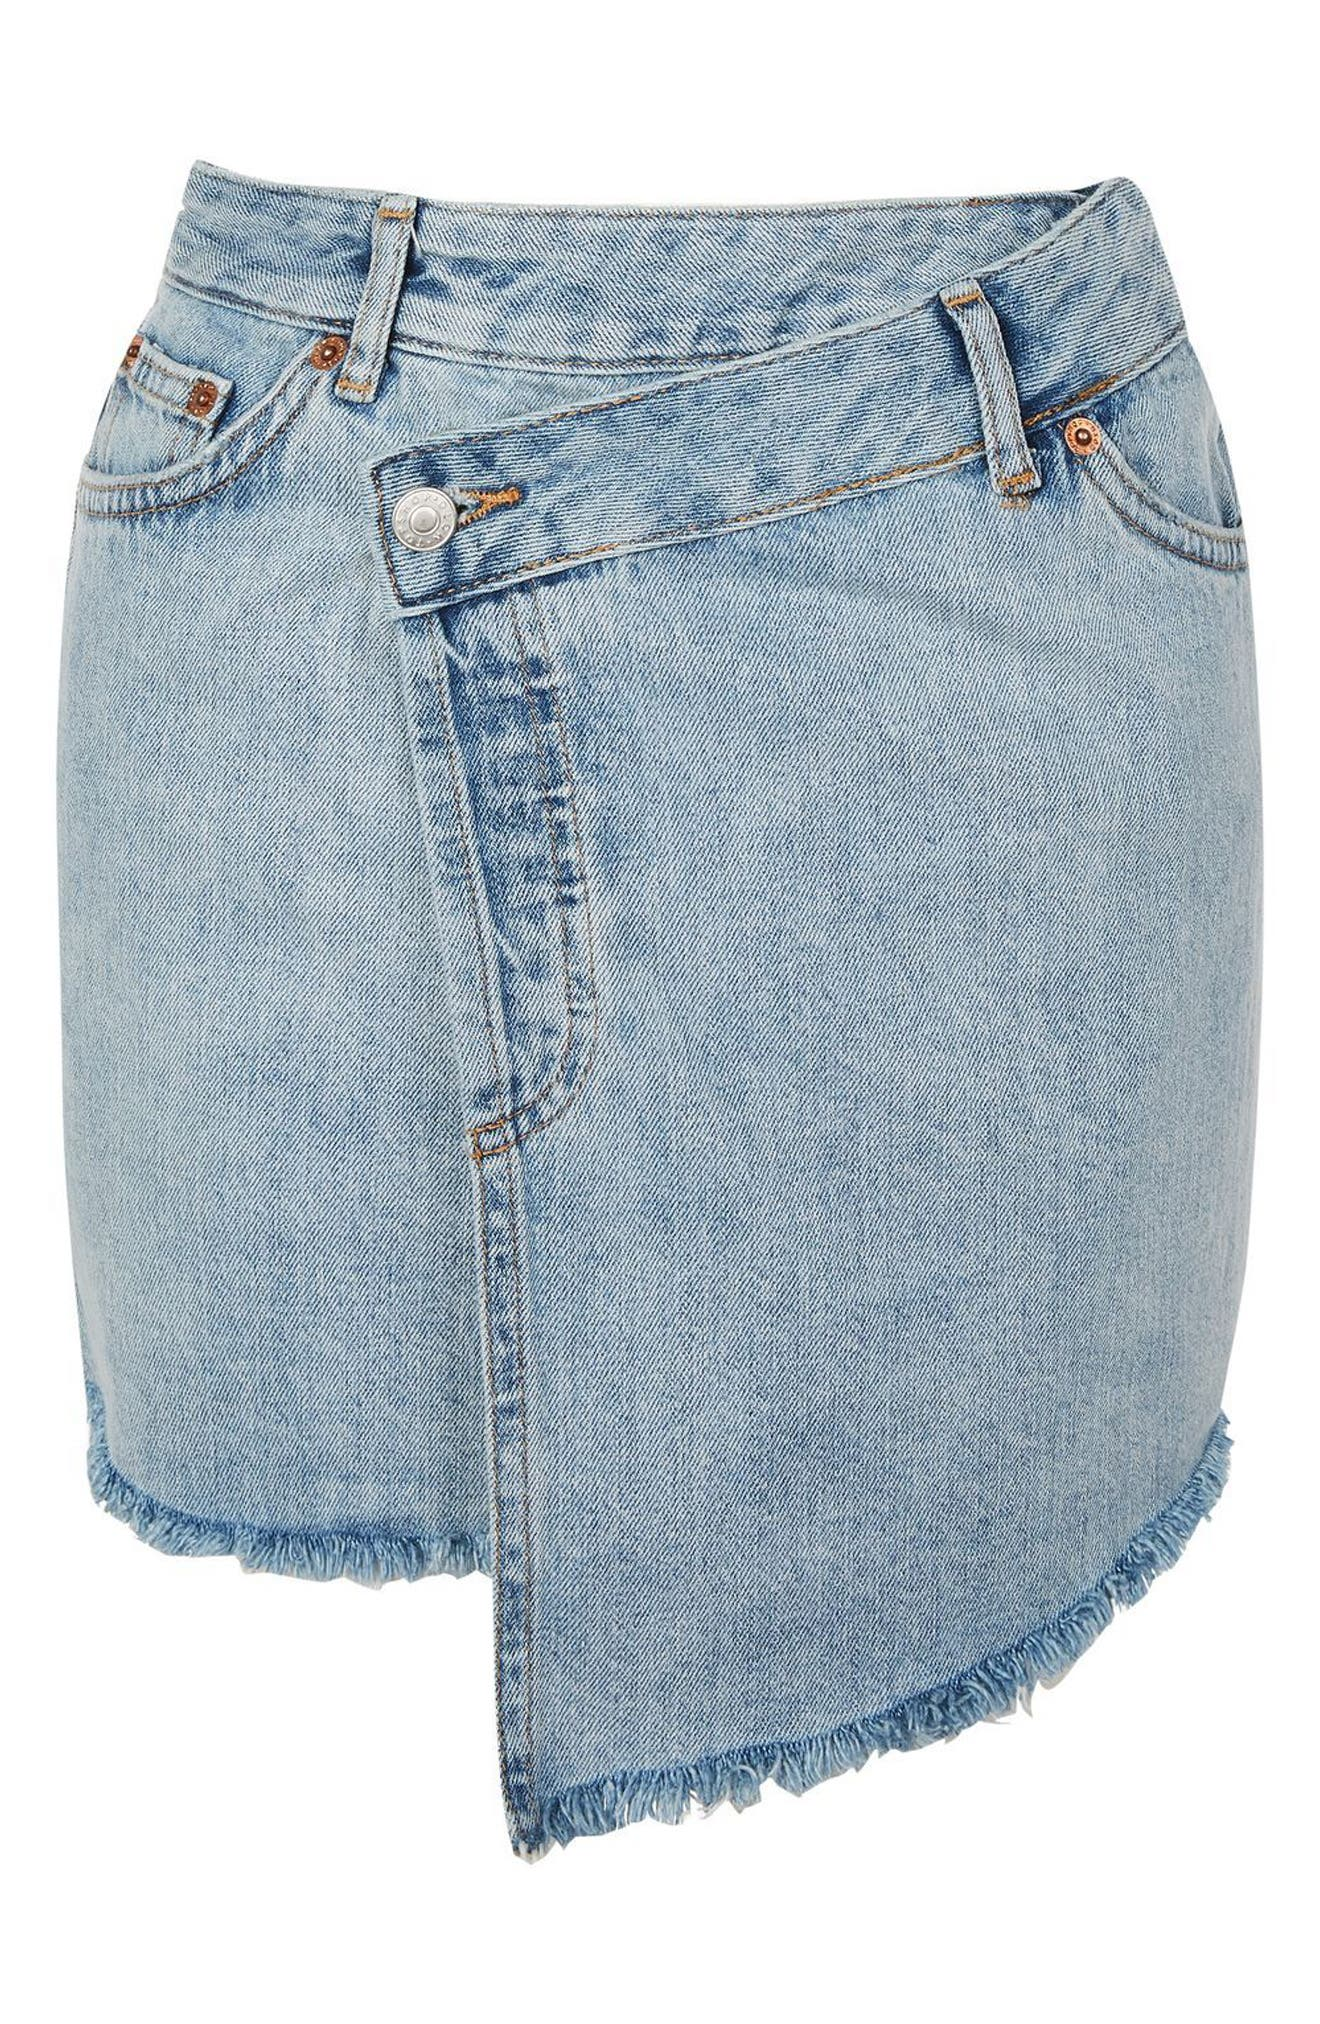 Alternate Image 3  - Topshop Deconstructed Wrap Denim Skirt